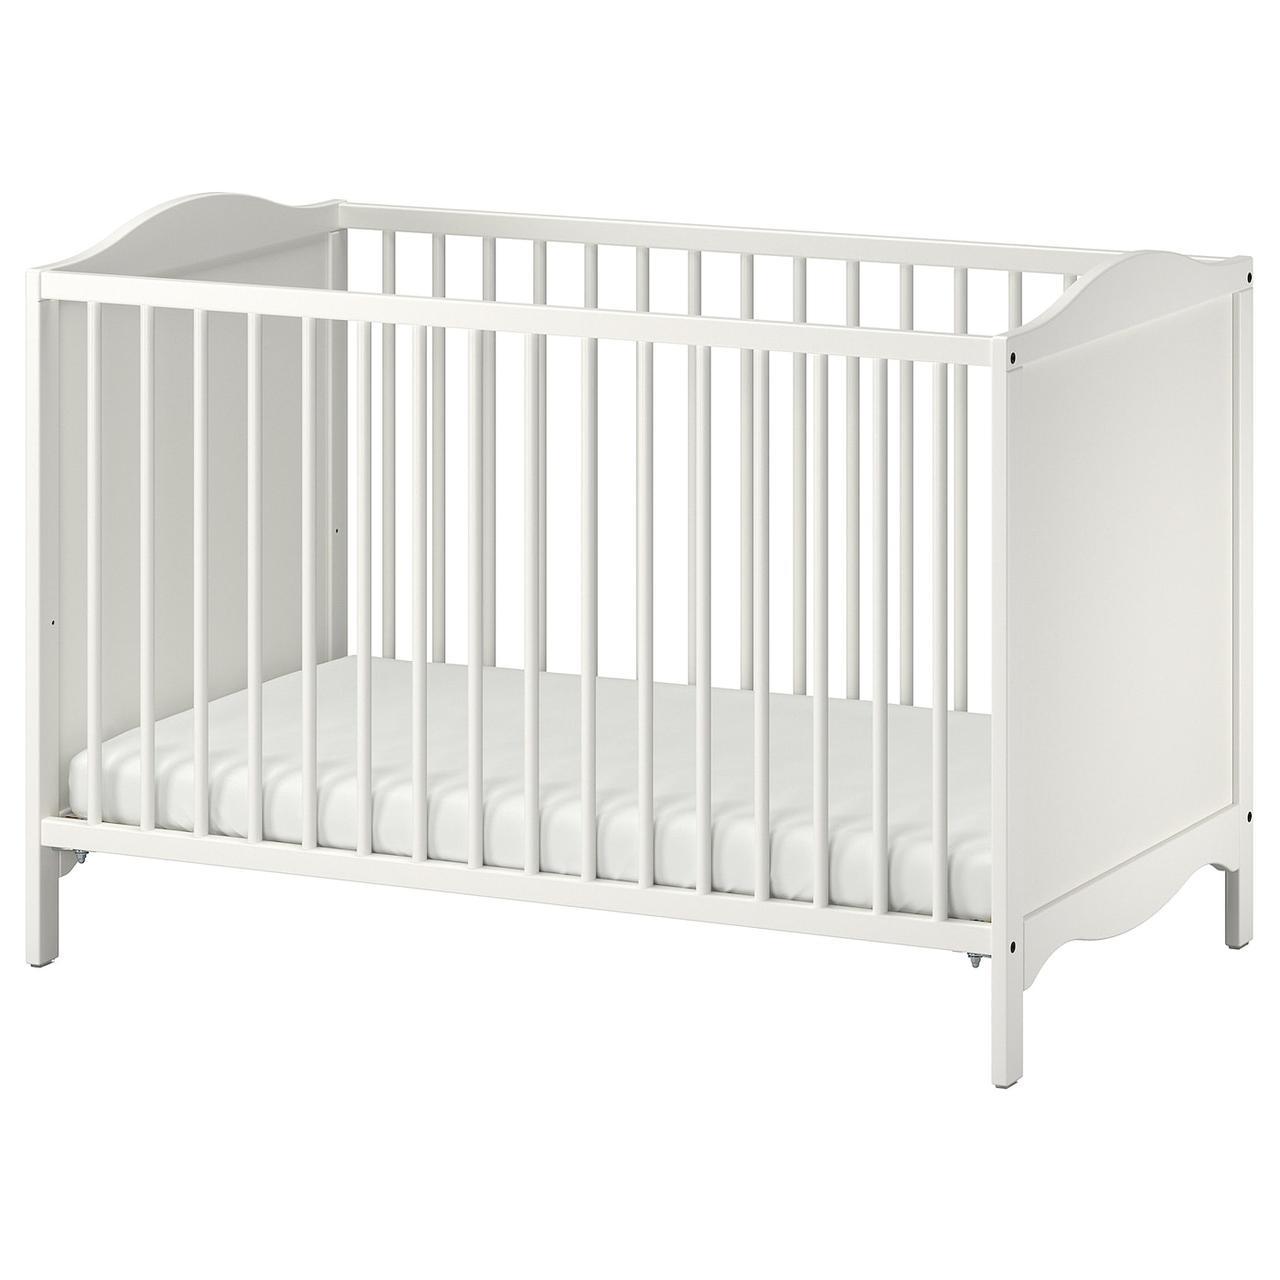 IKEA SMÅGÖRA Кровать детская, 60x120 см